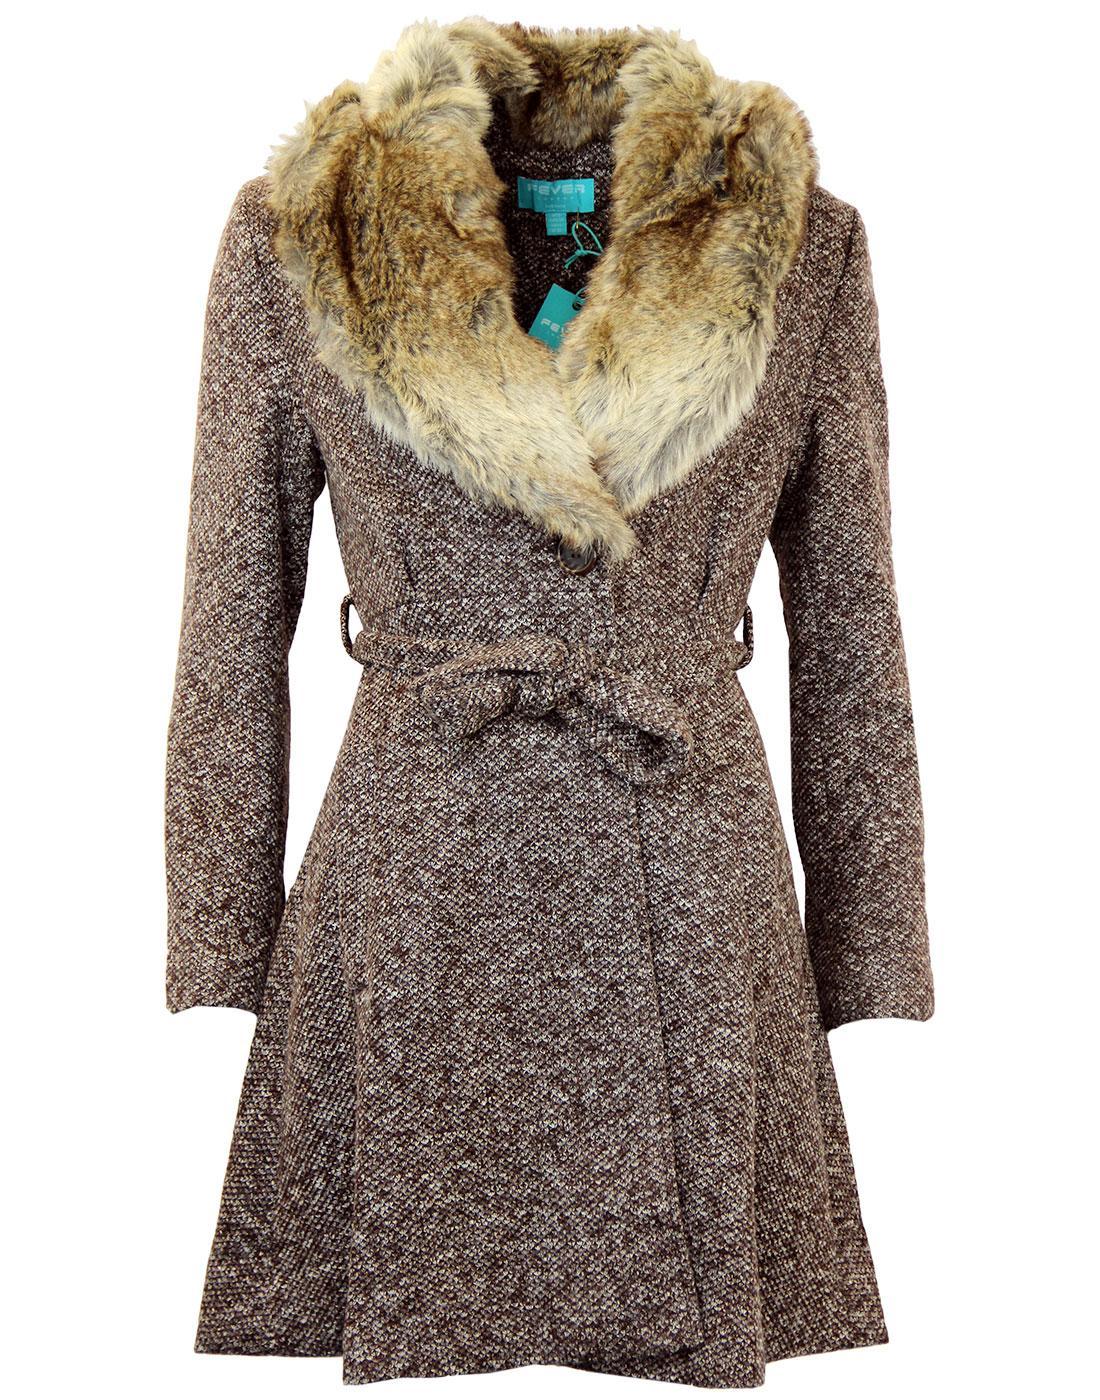 FEVER Manhattan Retro 60s Faux Fur Collar Belted Tweed Coat Brown